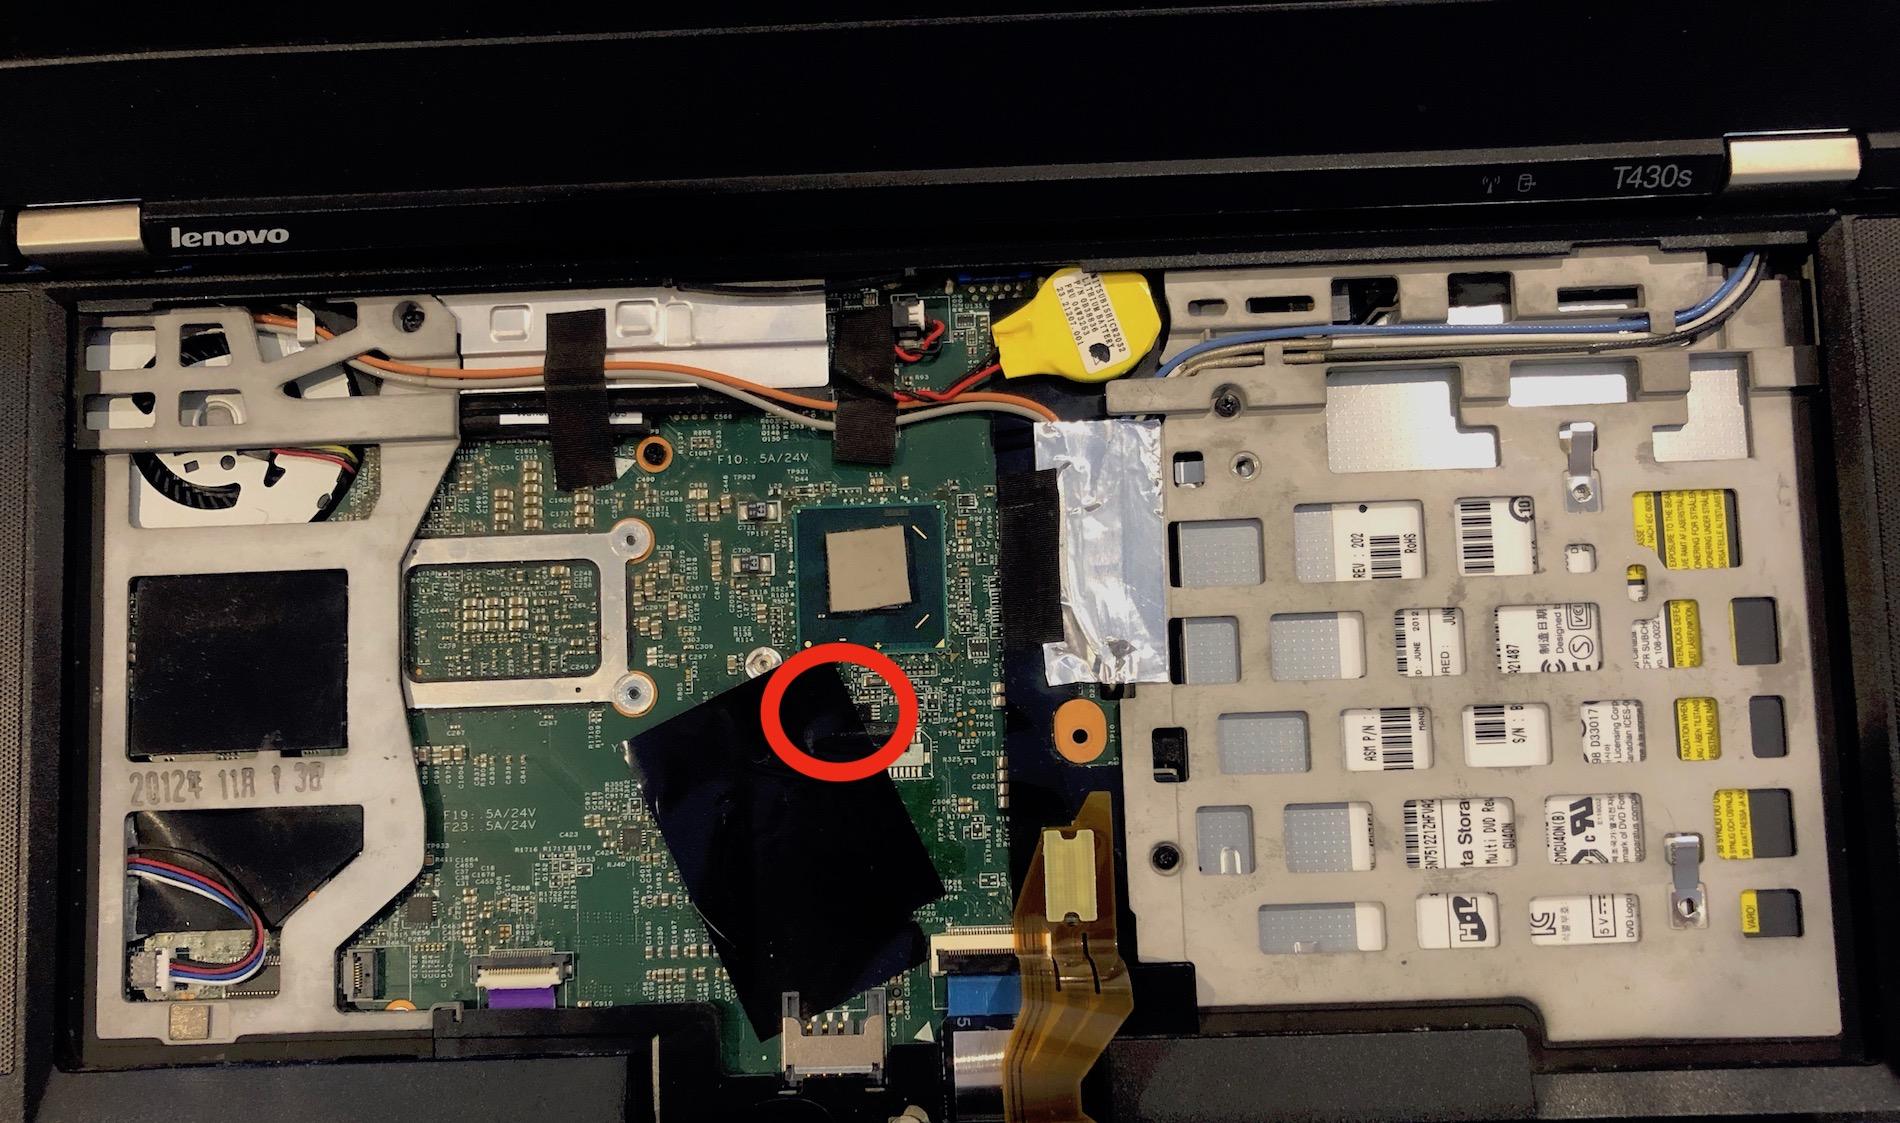 Lenovo Thinkpad T430s Supervisor Password Removal • htr3n's